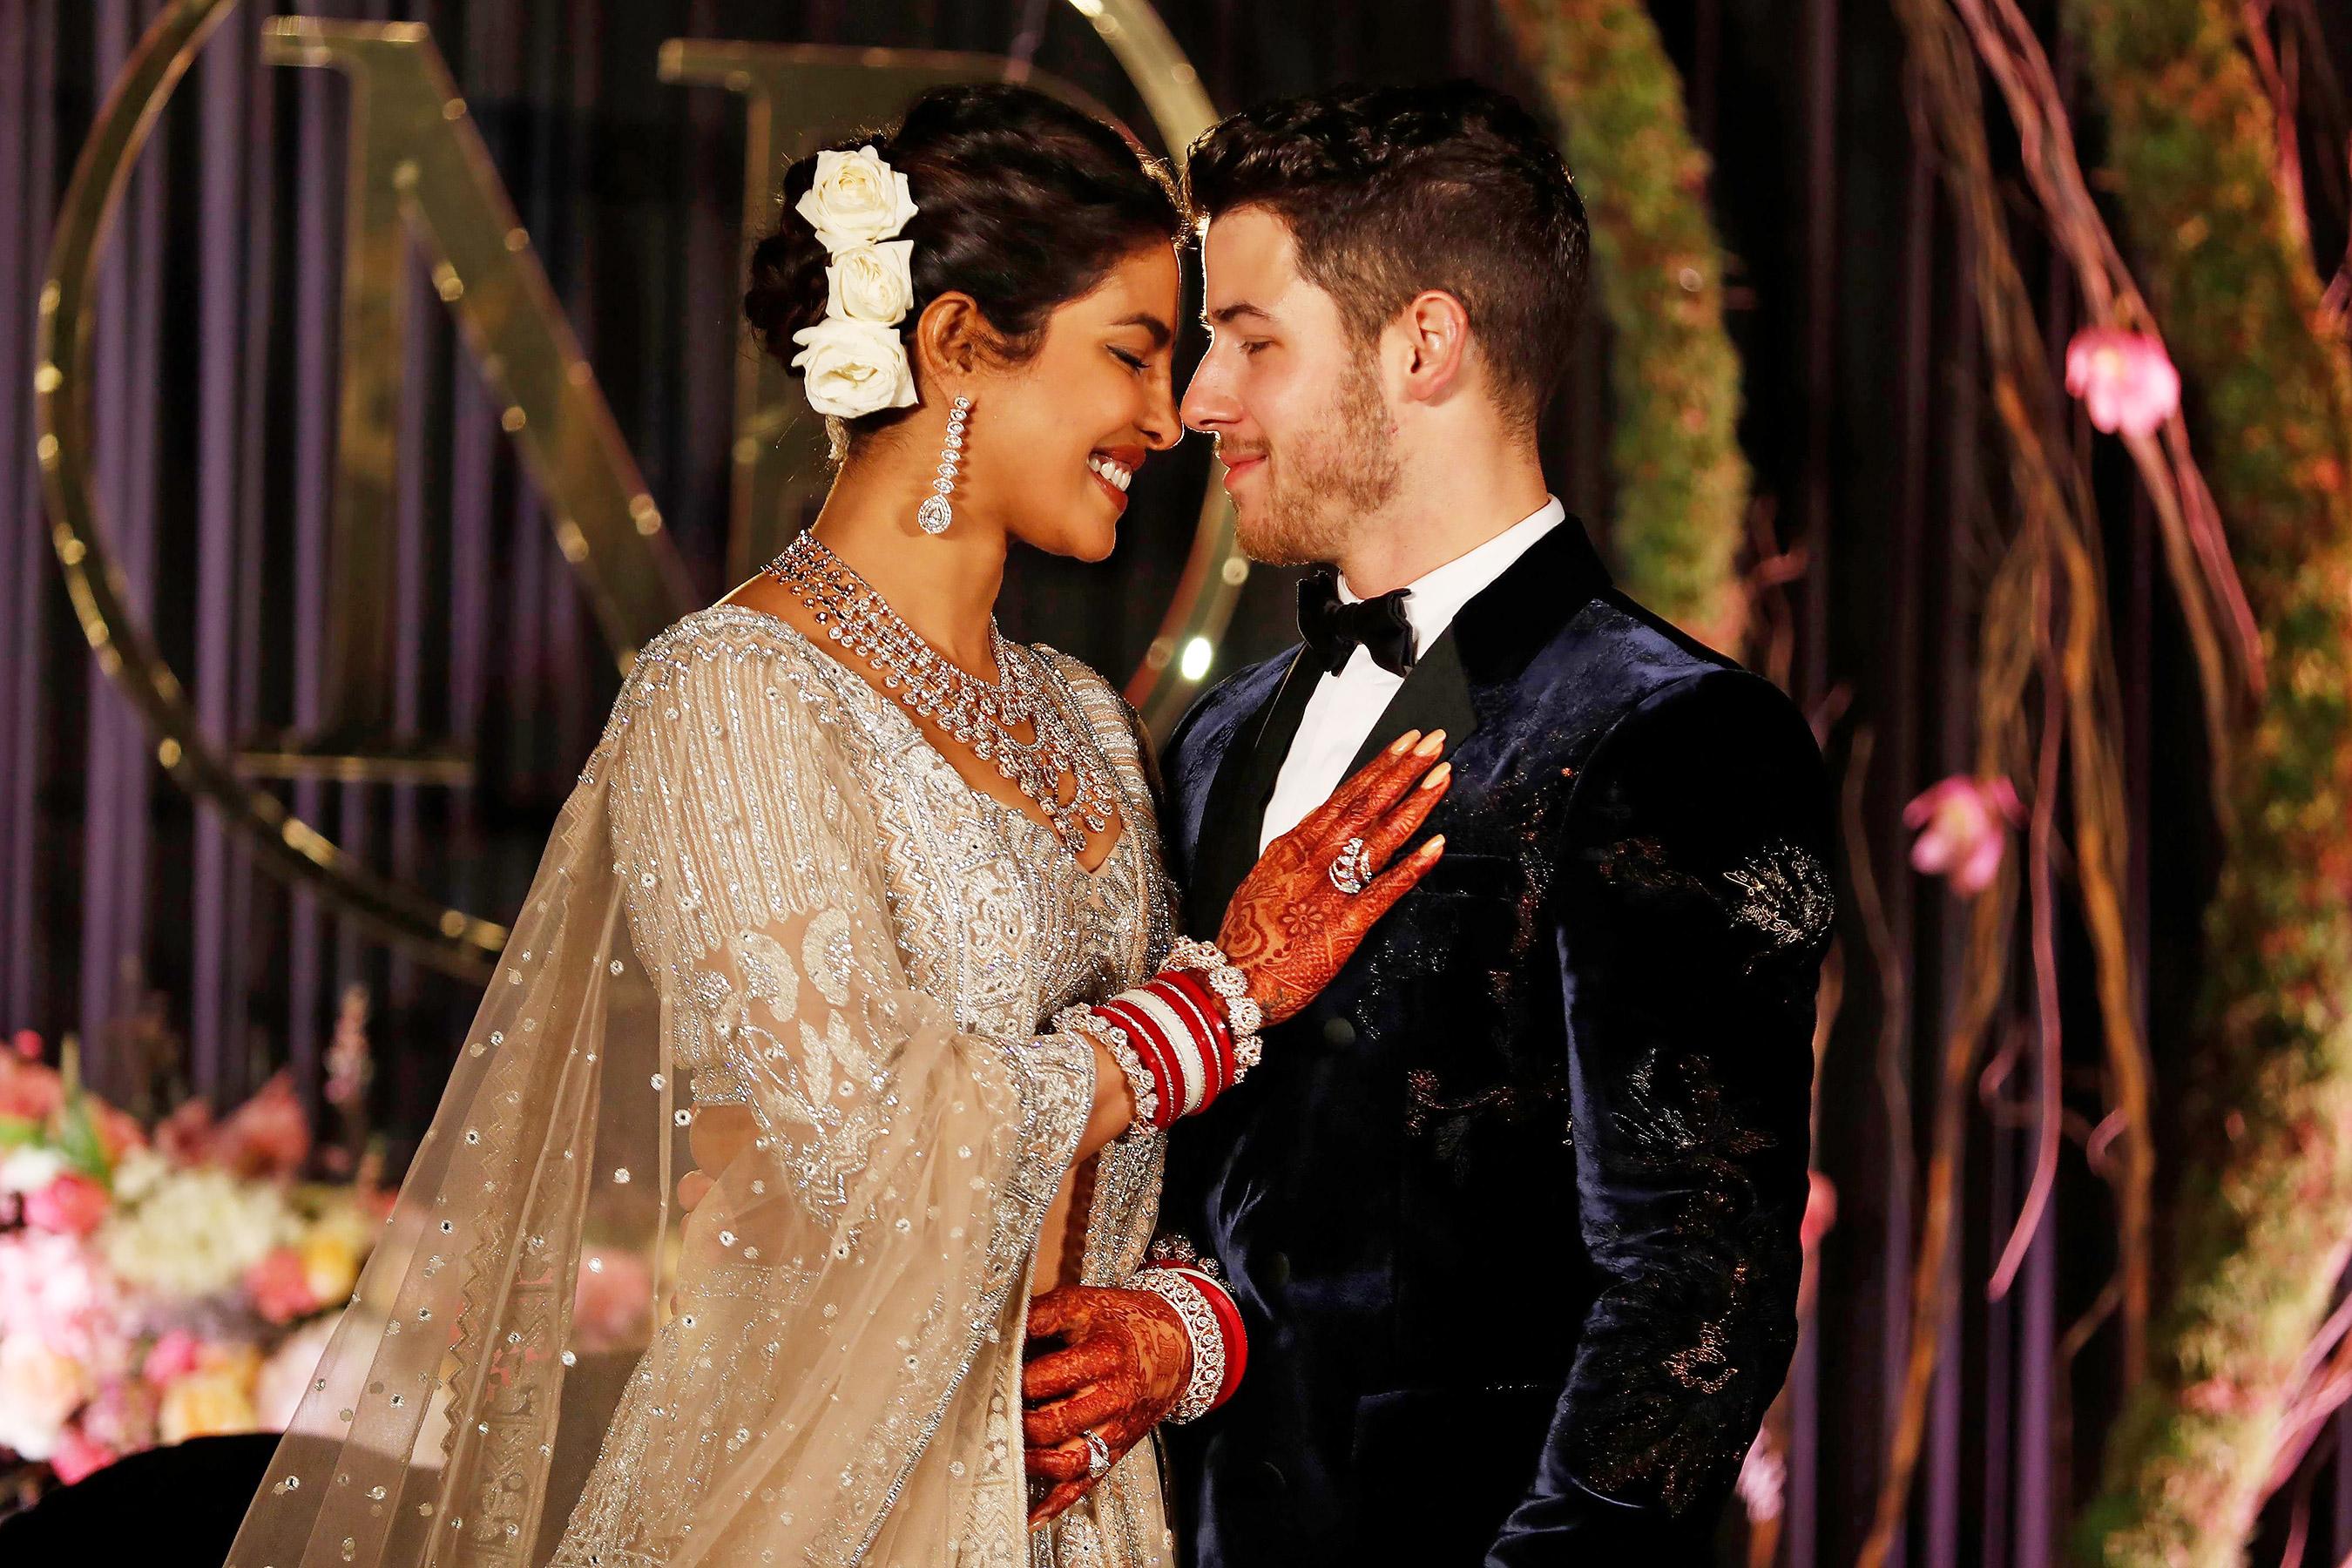 Honeymoon and Babies! Nick Jonas and Priyanka Chopra Reveal Their Post-Wedding Plans